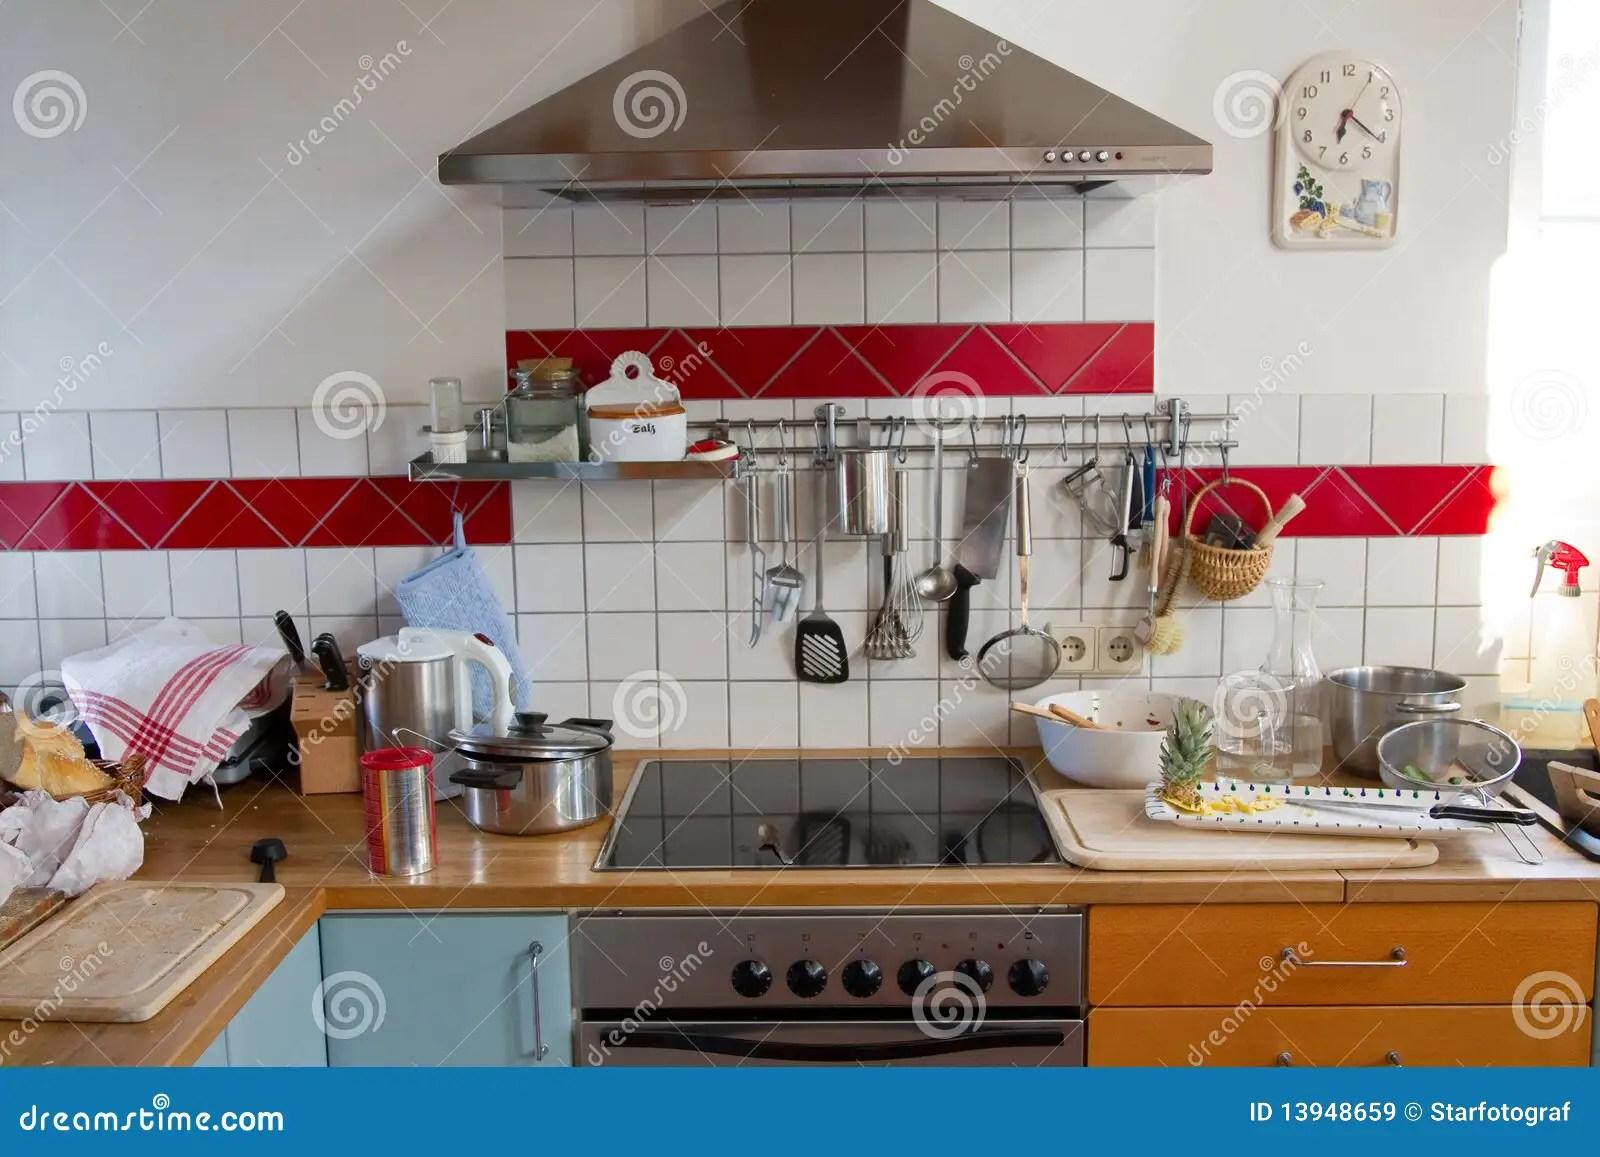 Kitchen Chaos Stock Image Image Of Dishing Crockery